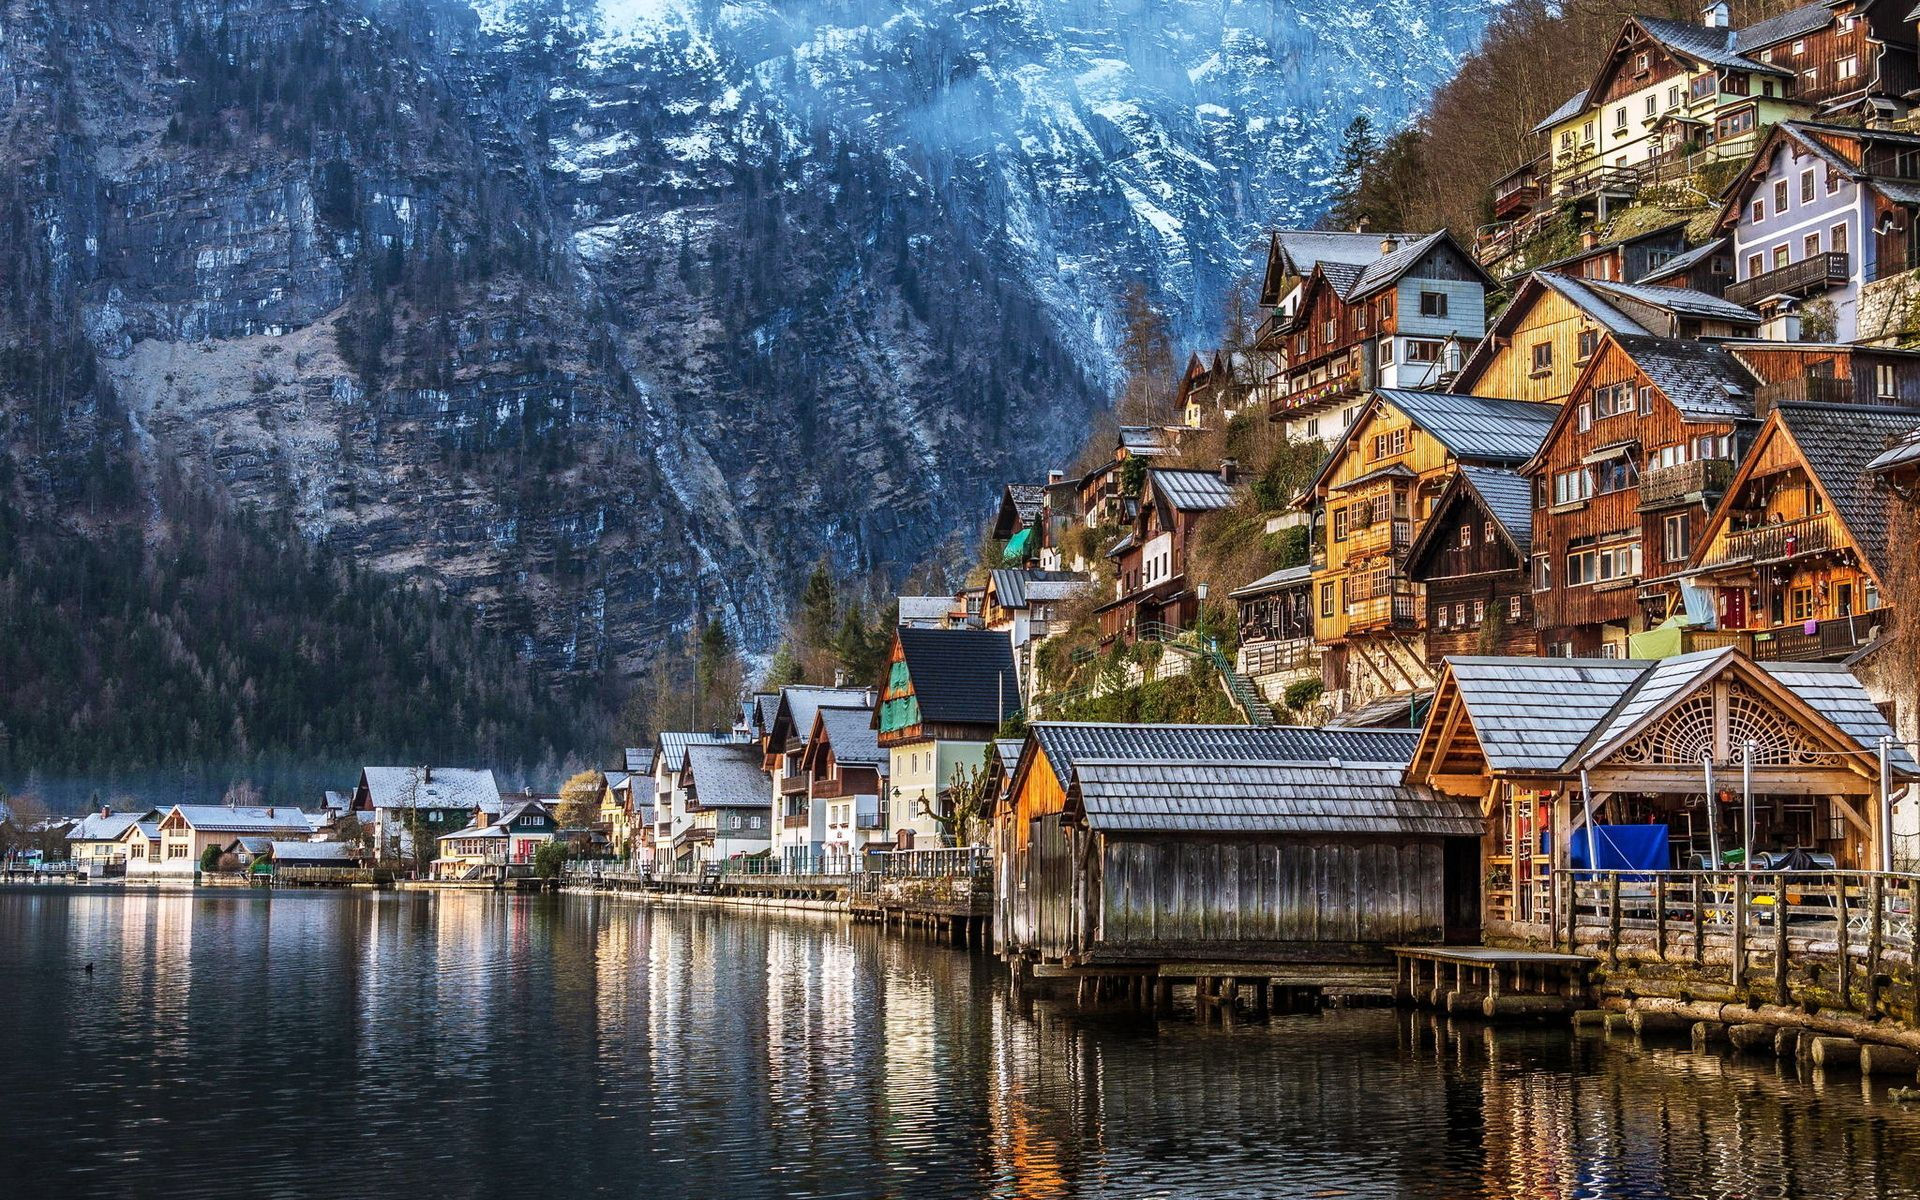 Hallstatt In Winter Austria Hd Wallpaper Lugares A Conocer Pinterest Beautiful 10 And